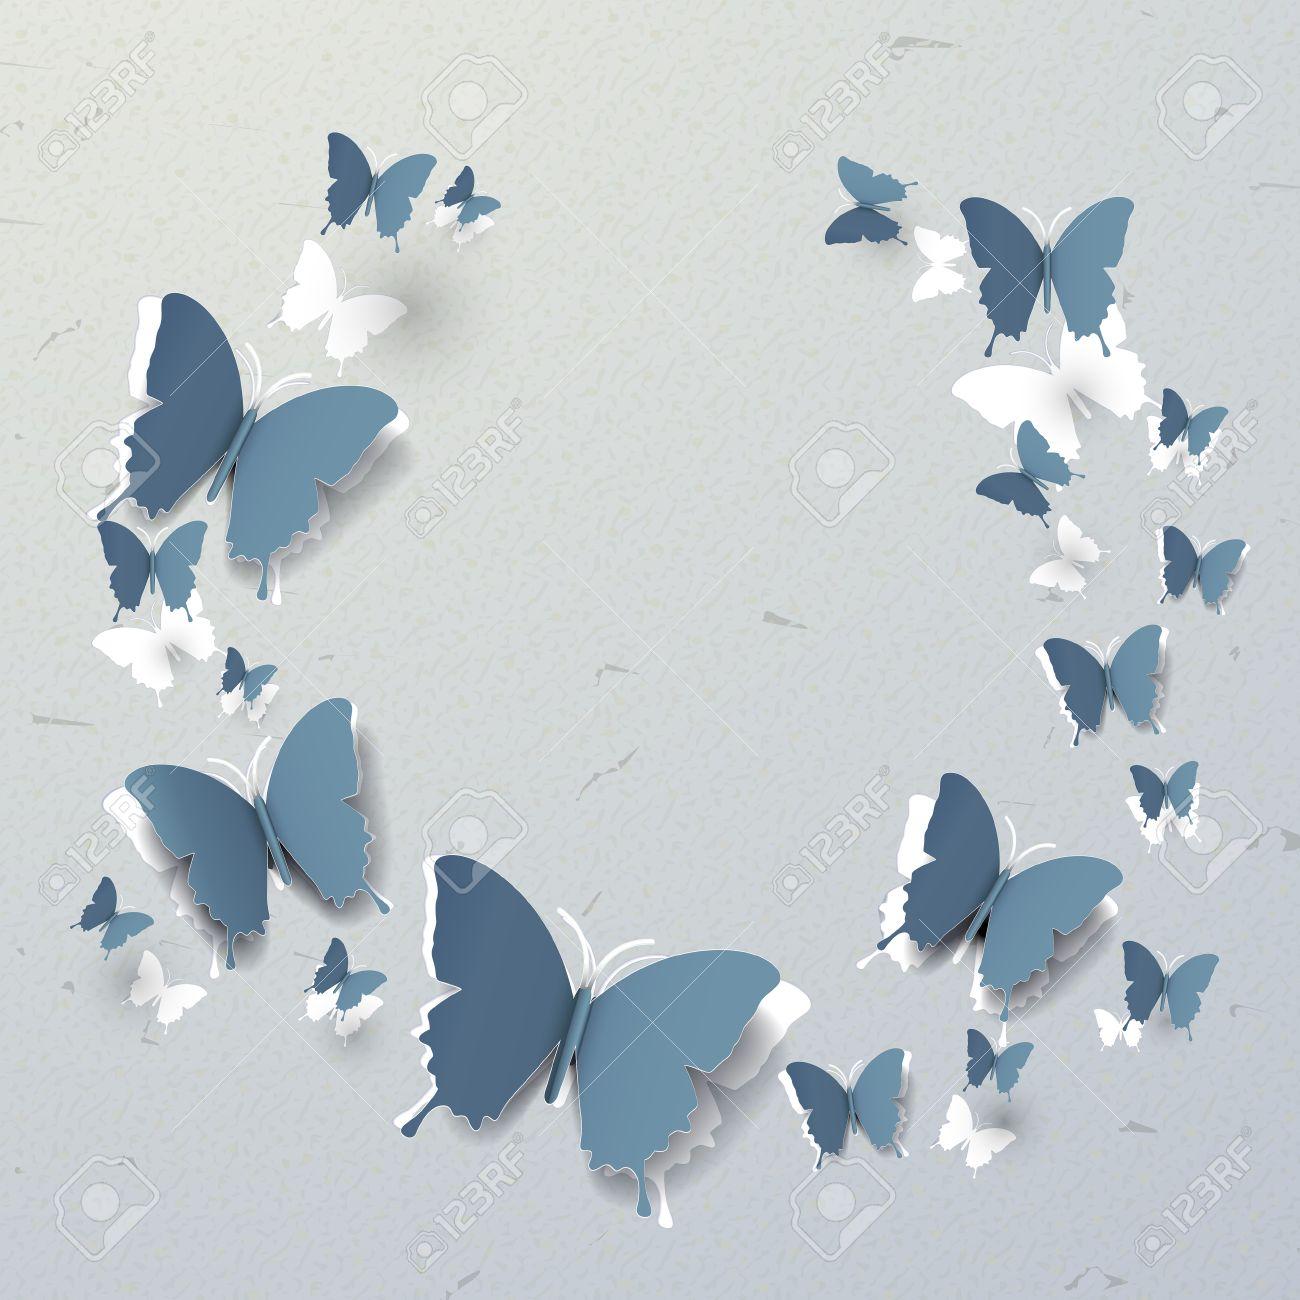 elegant 3d paper butterflies pattern cut out background royalty